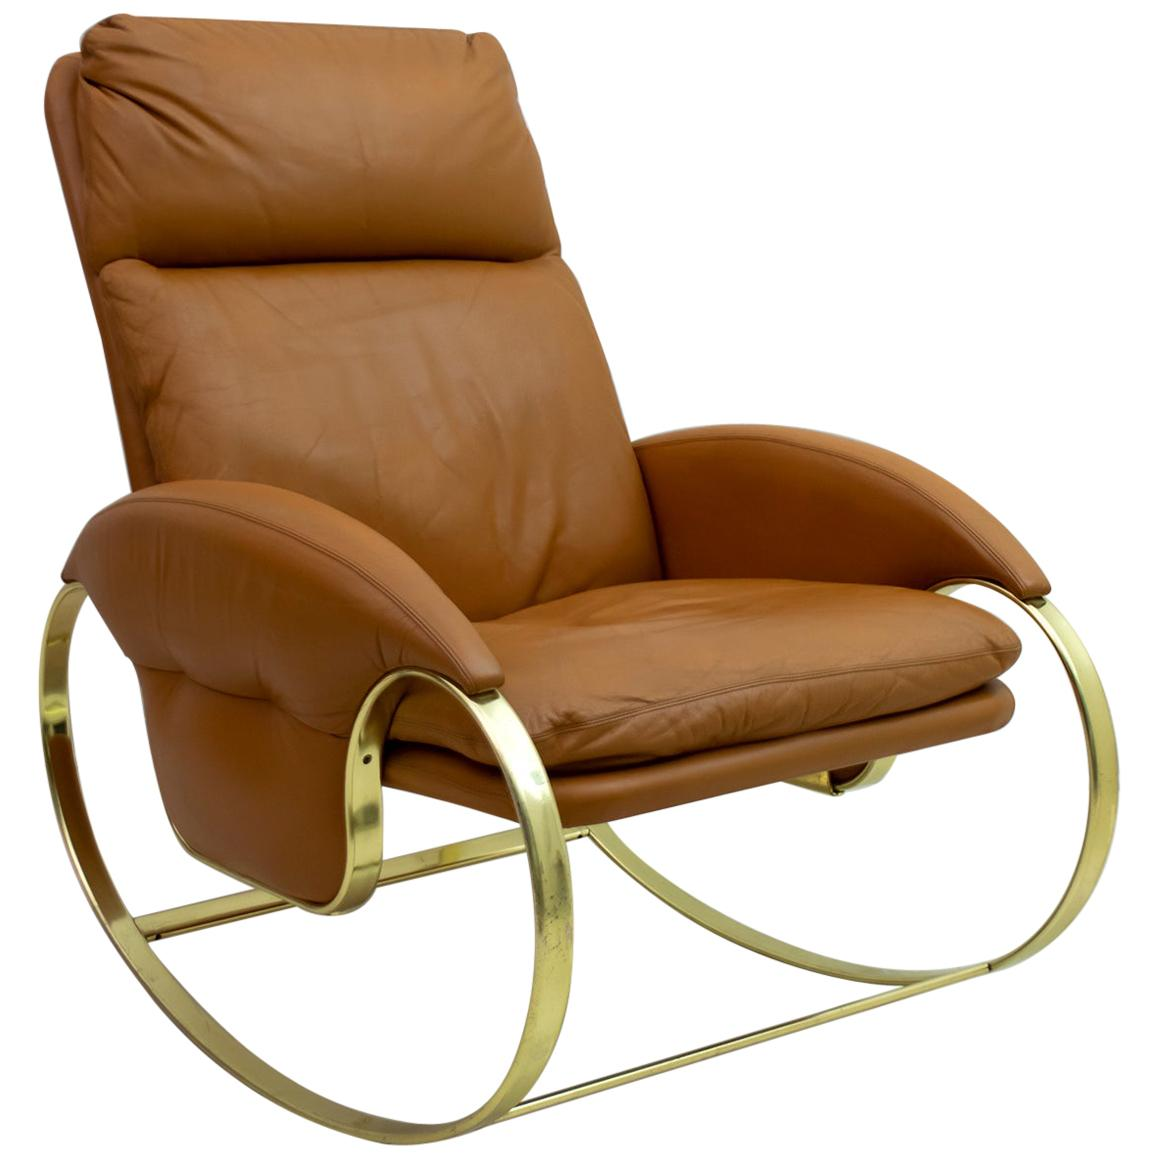 Guido Faleschini Mid-Century Modern Italian Real Leather Rocking Chair, 1970s